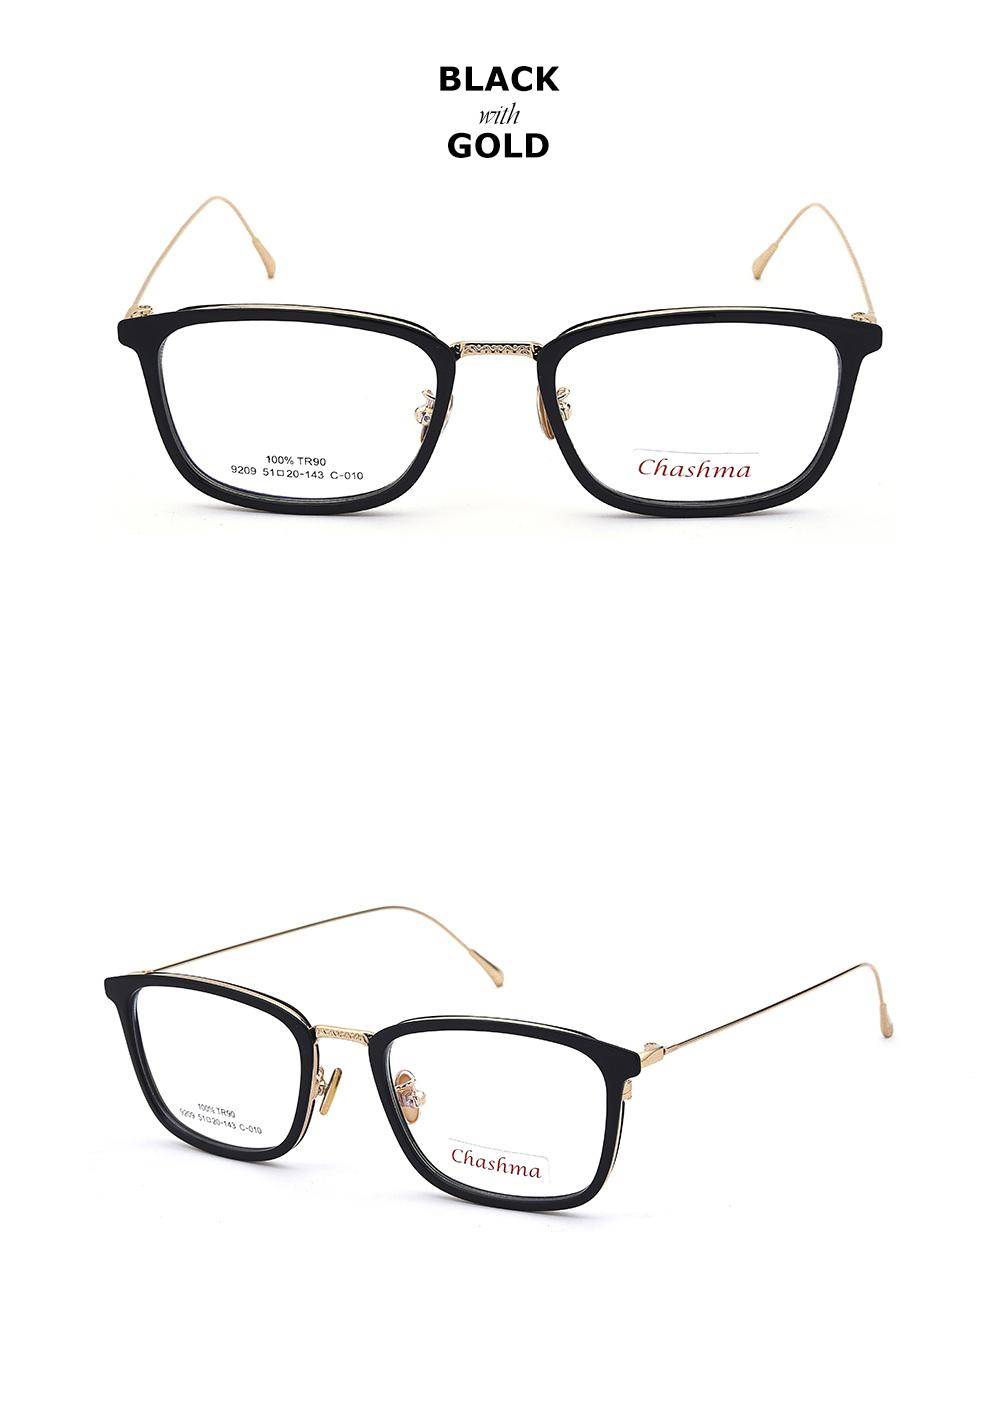 33b494ba40 Chashma Brand TR 90 Black Eyeglasses Style armacao para oculos de grau  feminino Women s Glasses Clear Lenses